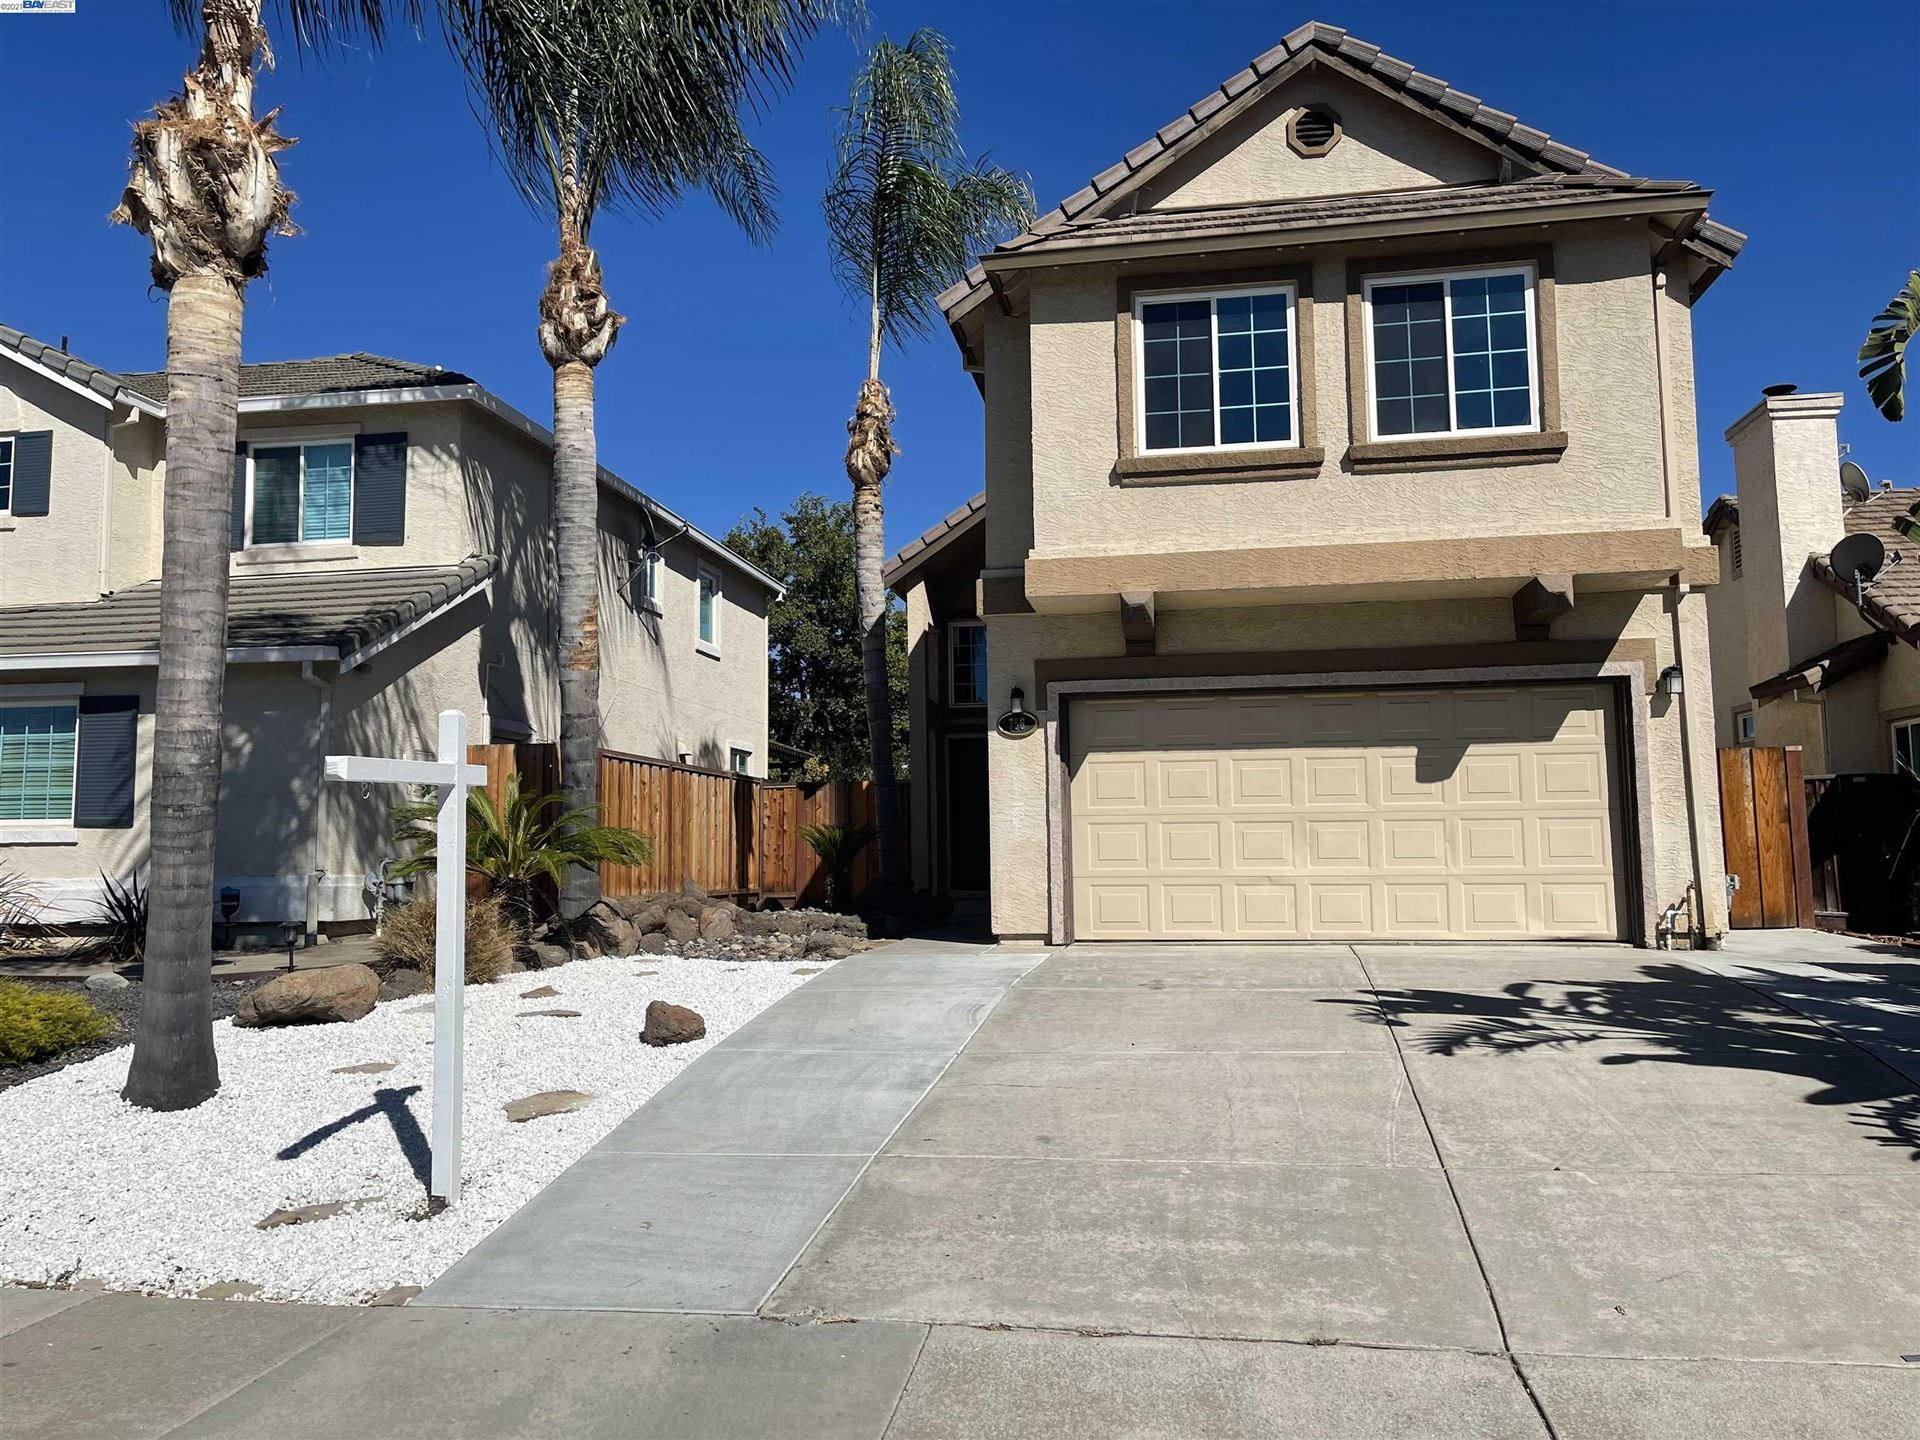 Photo of 756 Crossridge Ct, BRENTWOOD, CA 94513 (MLS # 40966758)